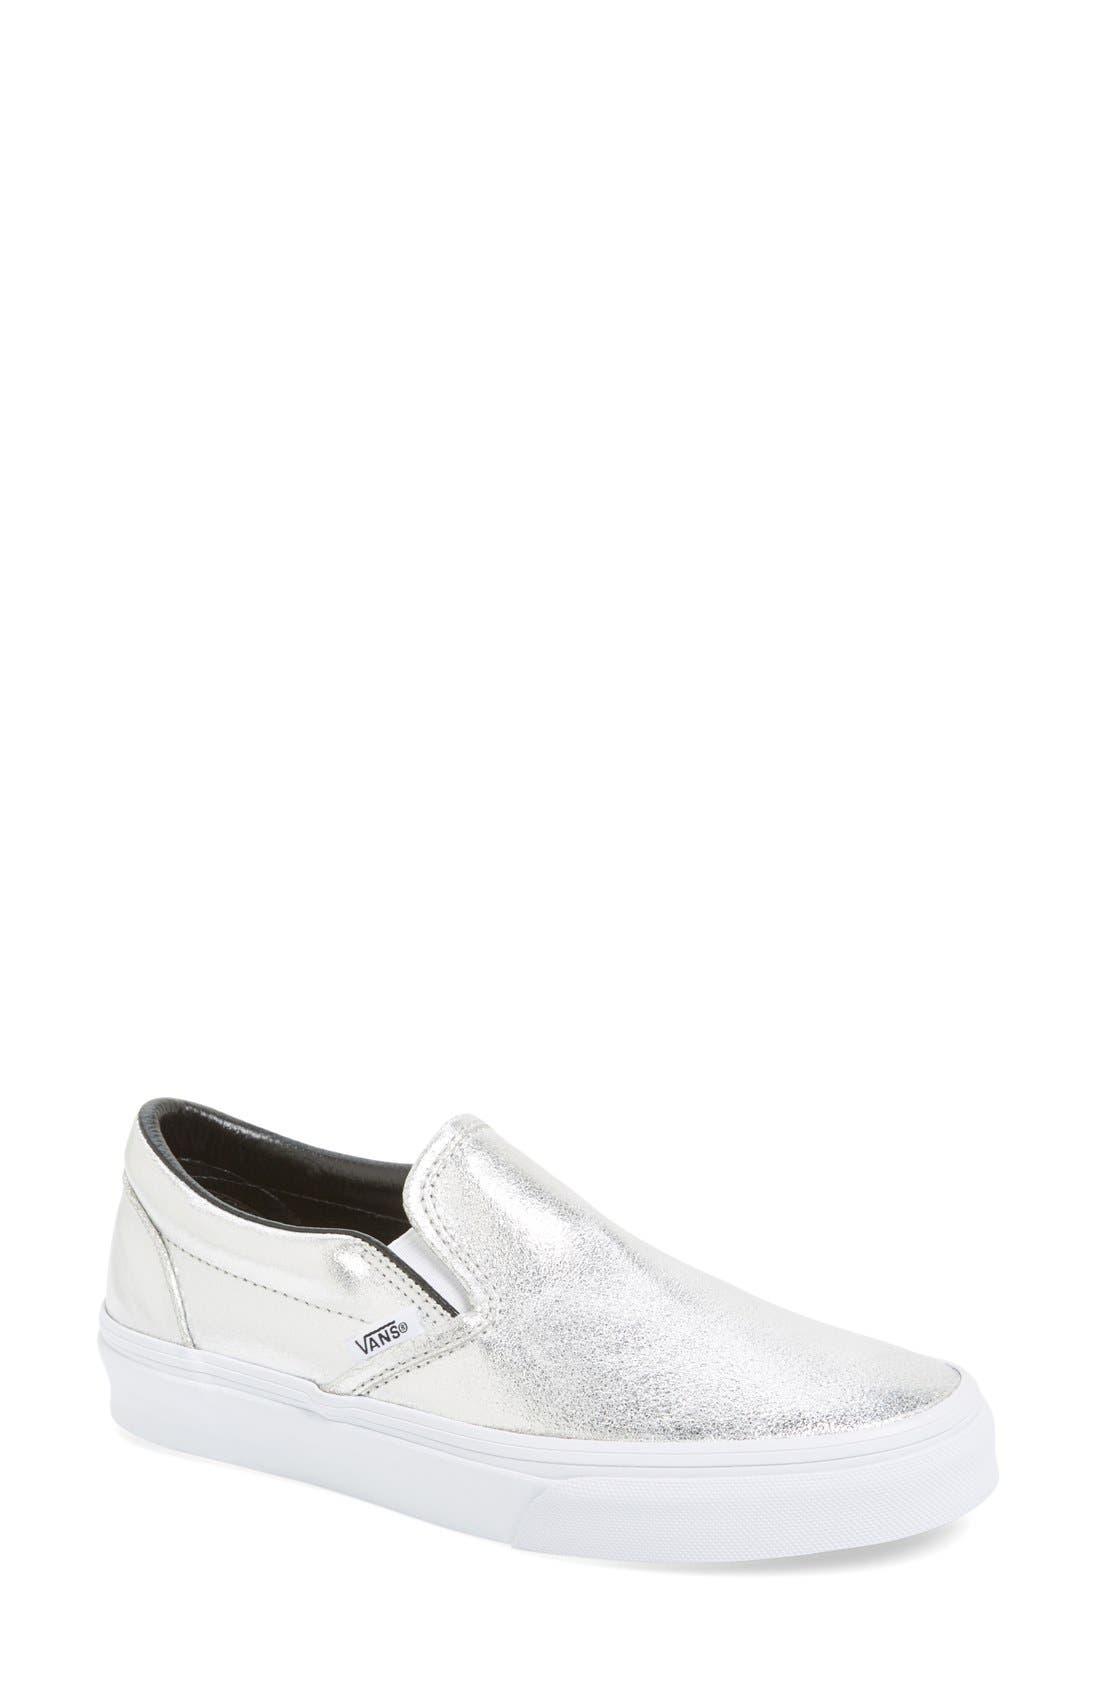 Alternate Image 1 Selected - Vans Metallic Leather Slip-On Sneaker (Women)